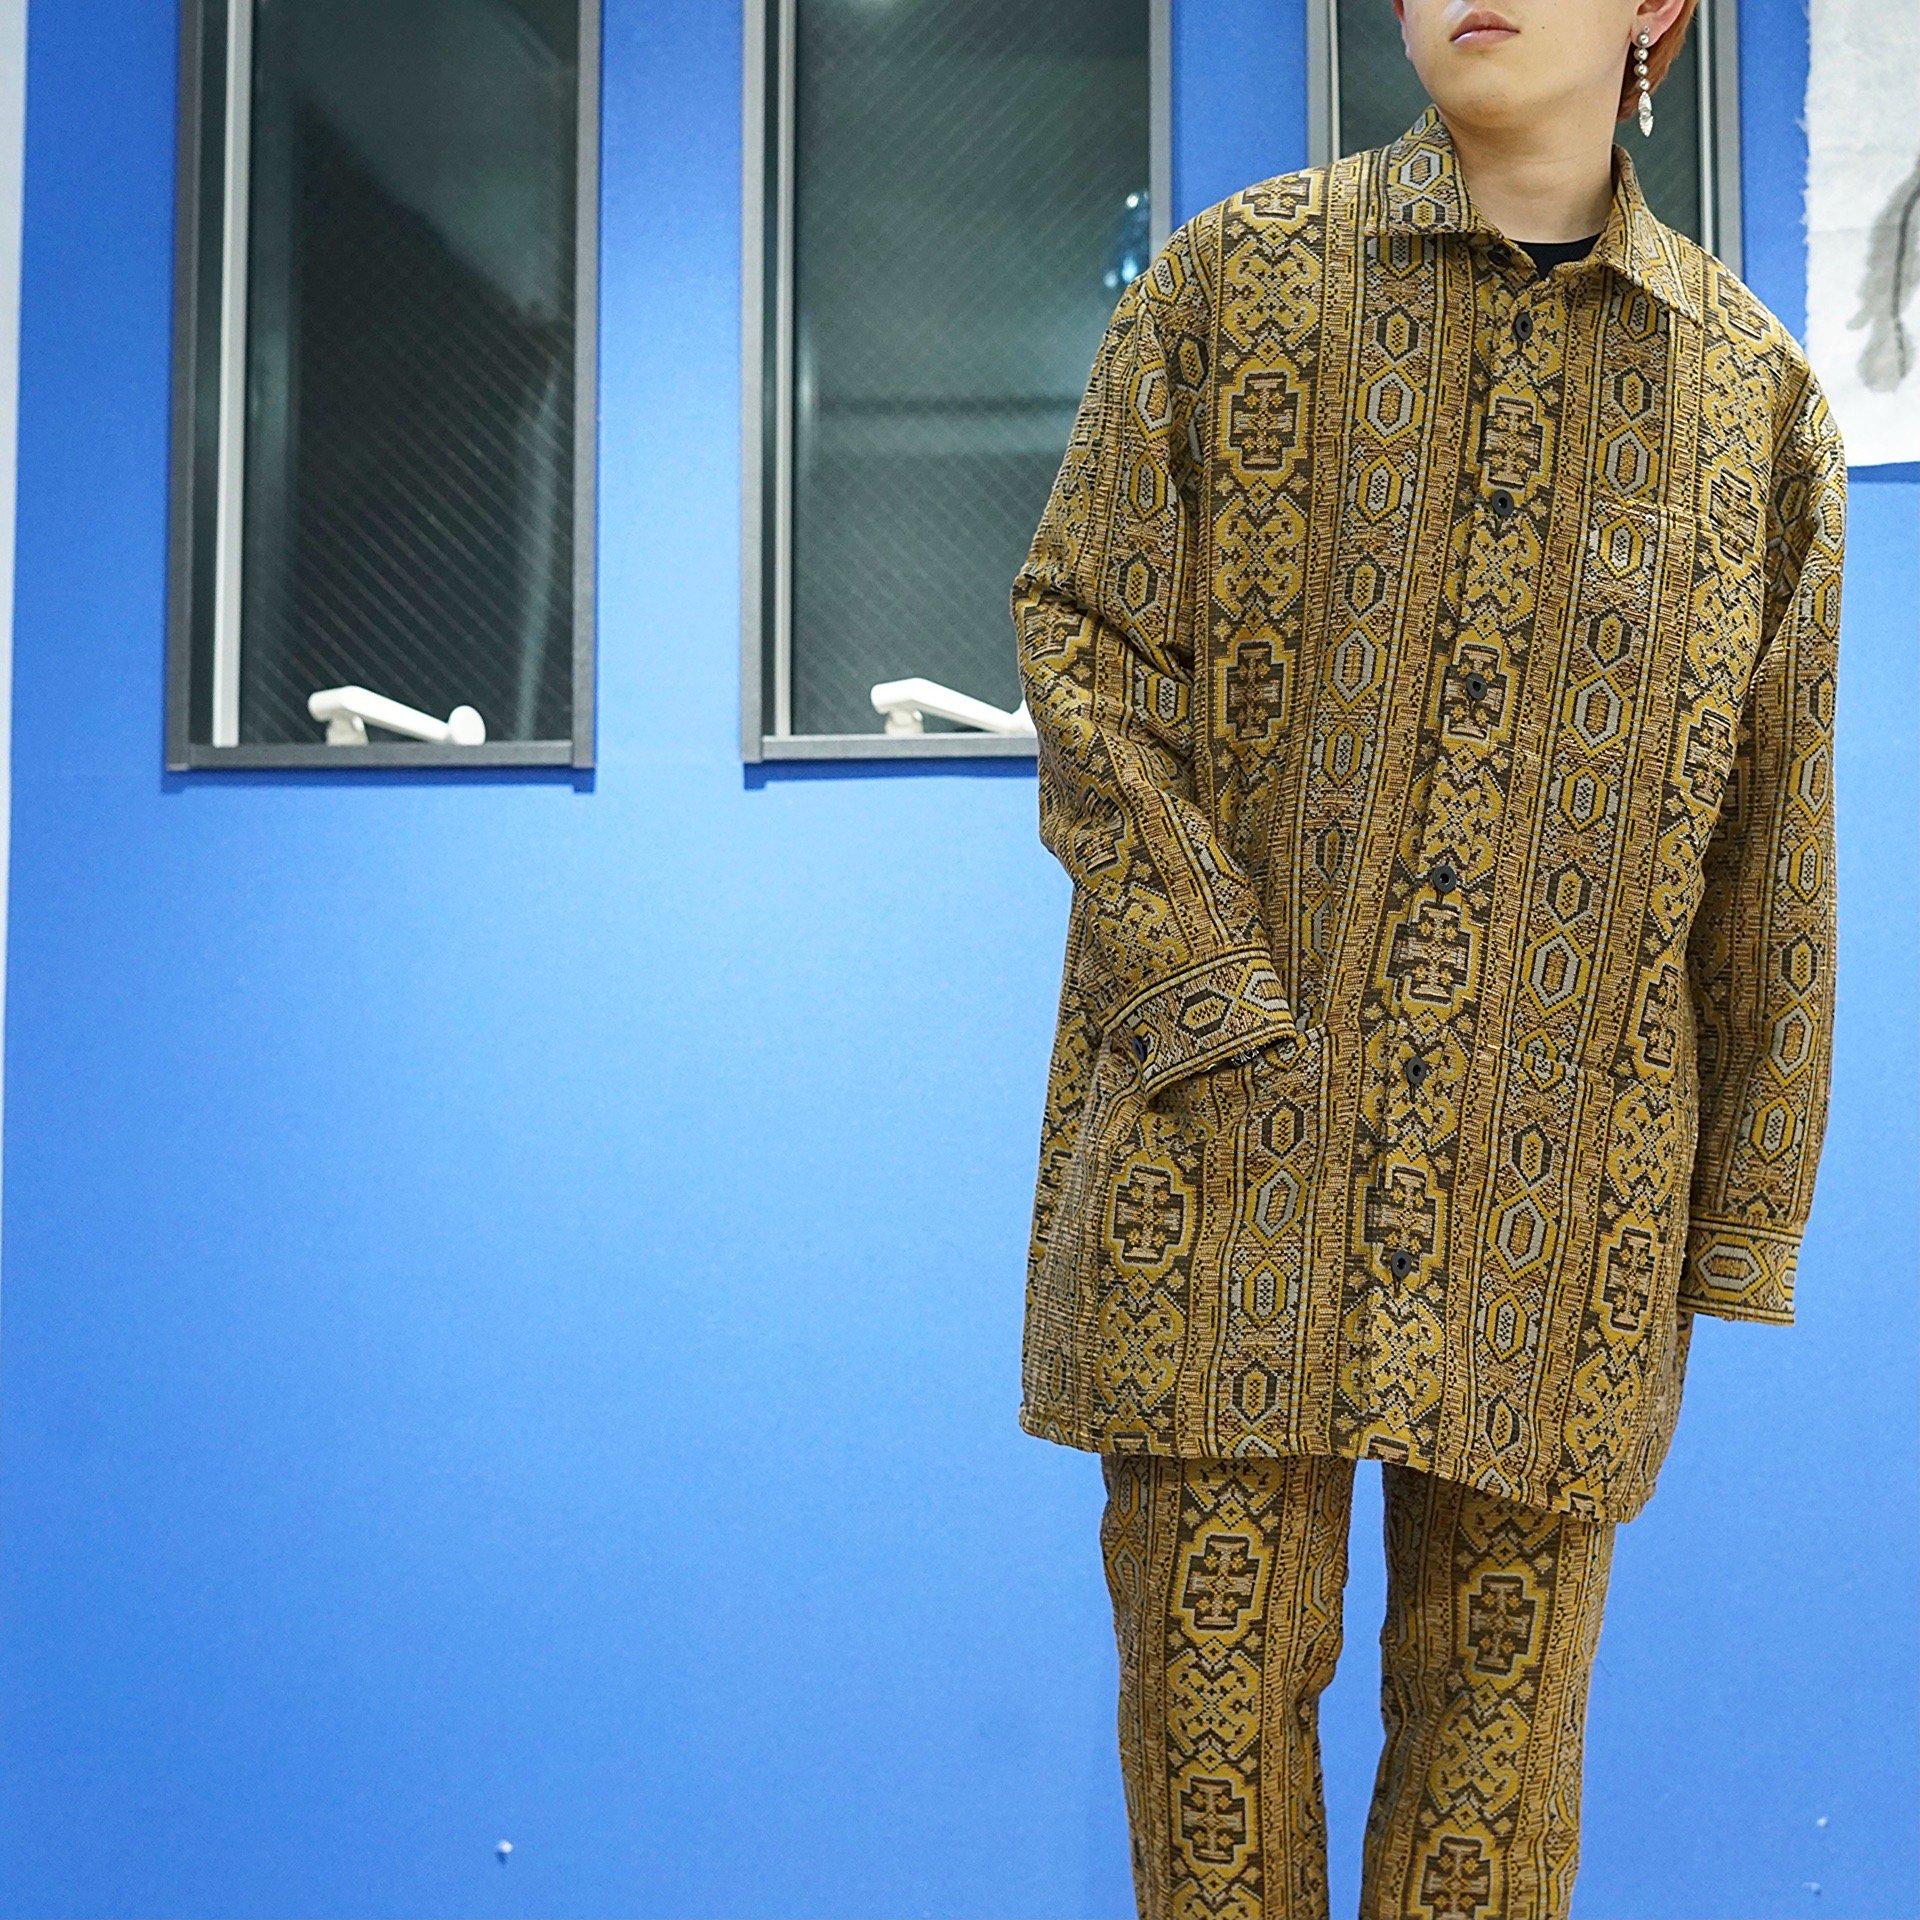 【QASIMI】<br>エスニックジャカード <br>オーバーサイズ シャツジャケット